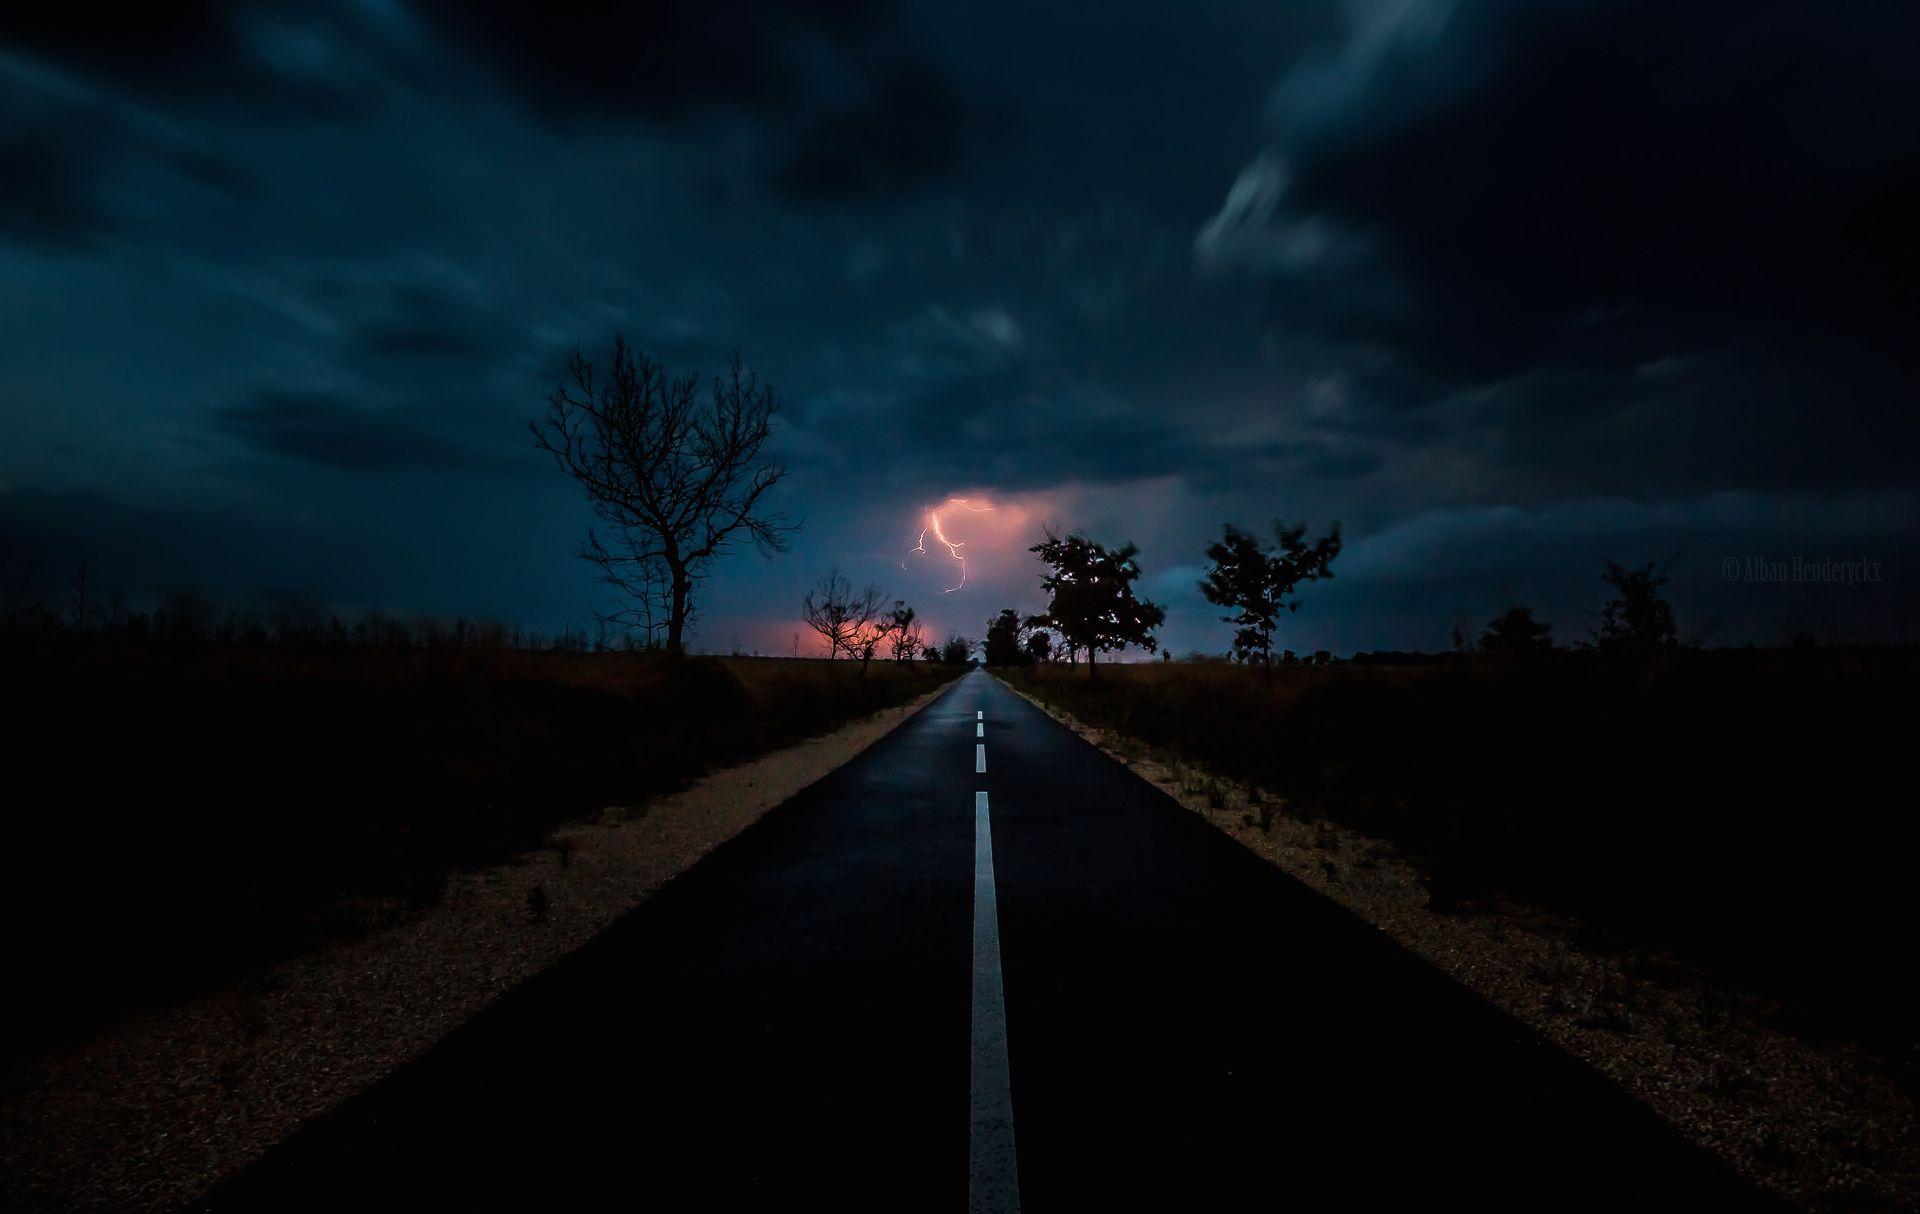 Anger falls on your way | Landscape Photographer - Fine Art Print & Photo Tours